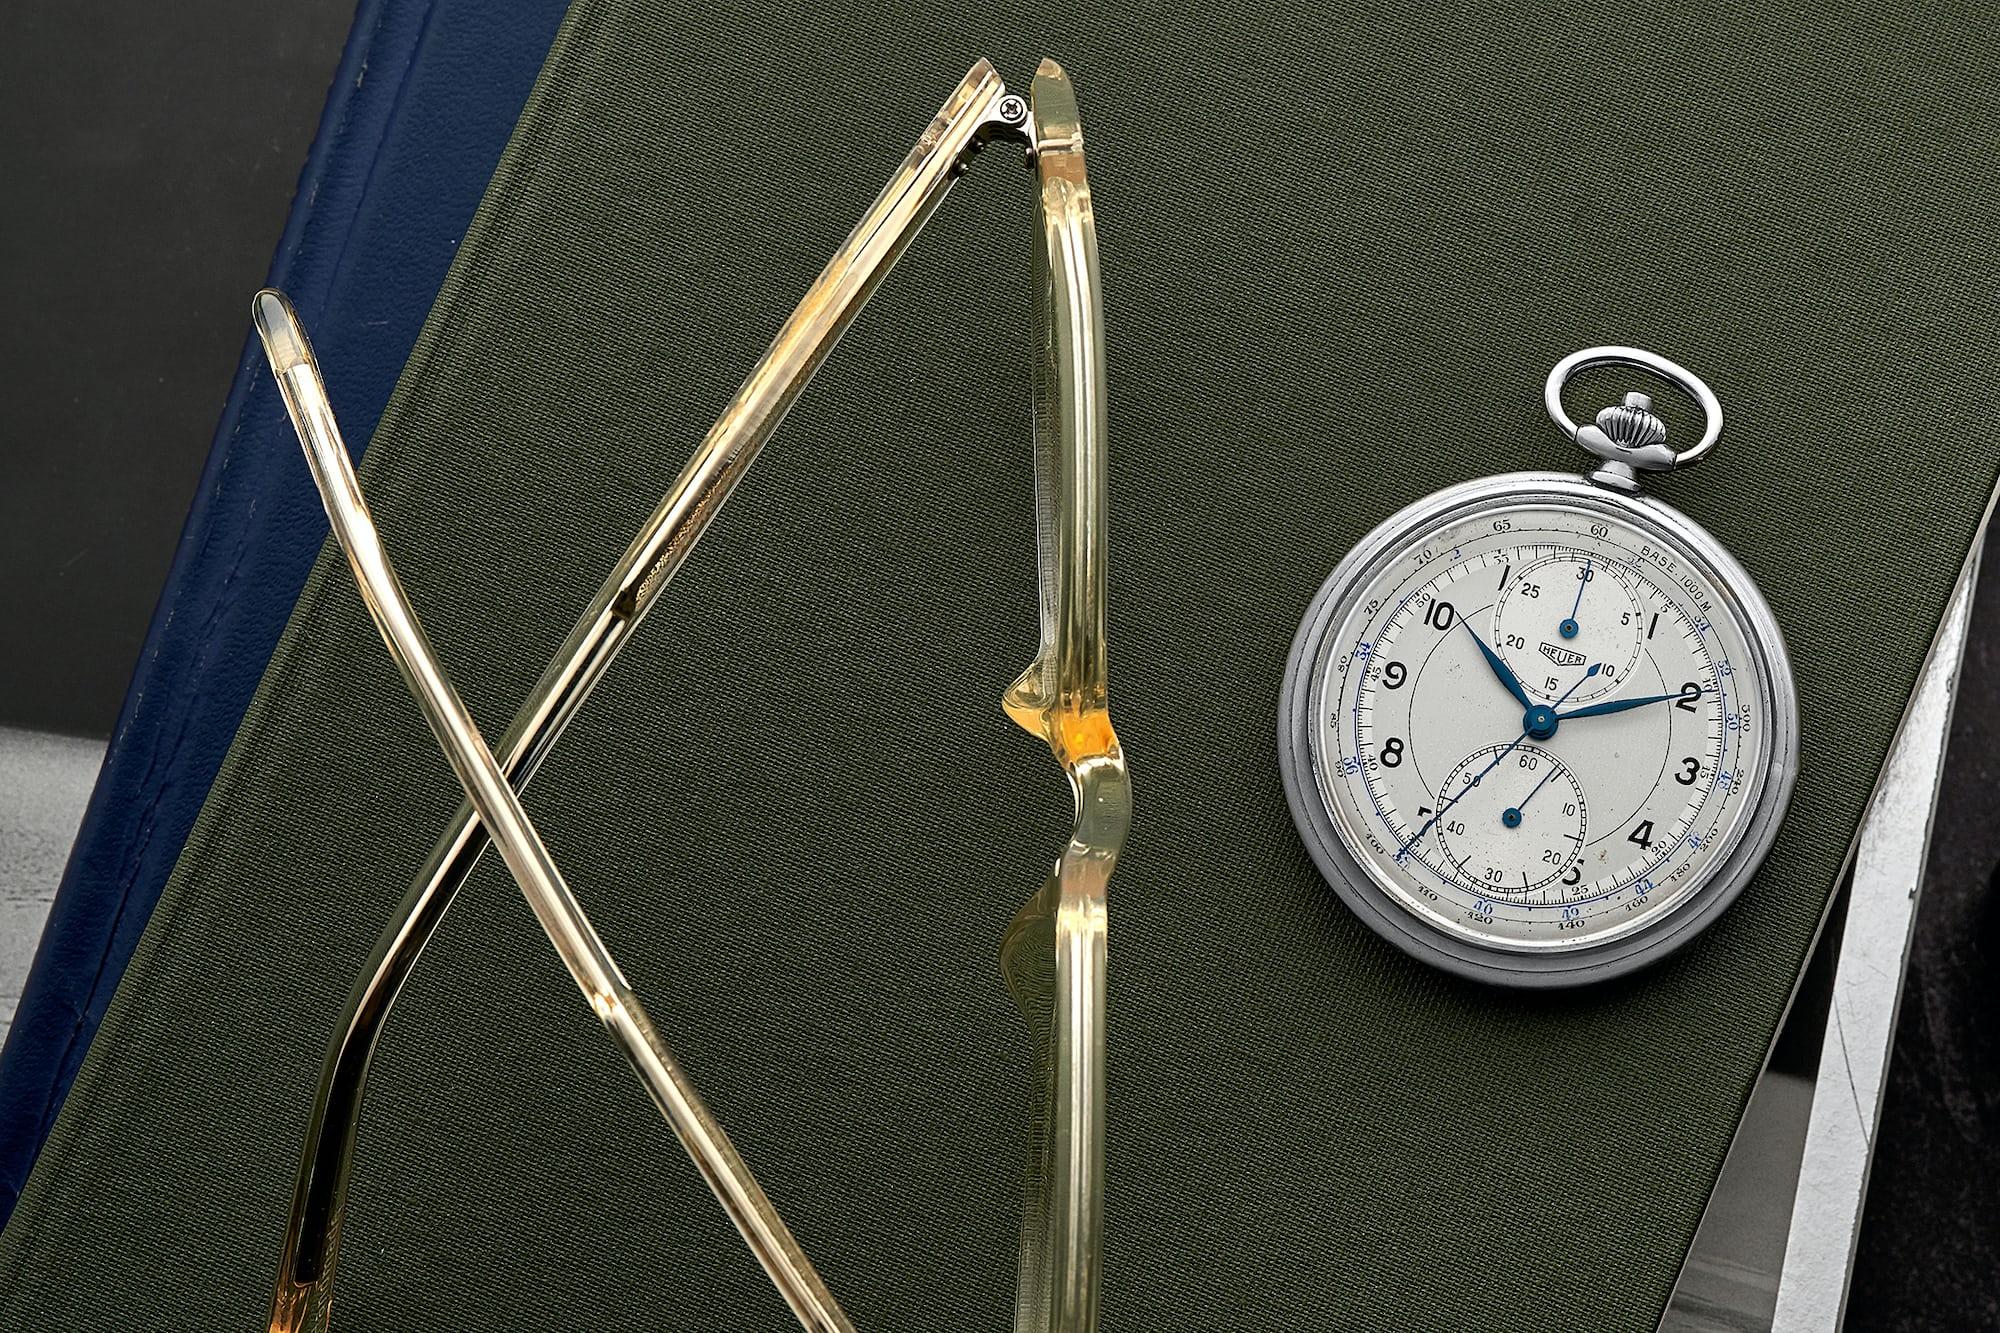 "<p><a href=""https://shop.hodinkee.com/products/heuer-ss-pocketwatch"" rel=""noopener"" target=""_blank""><u>1940s Heuer Single-Button Chronograph Pocket Watch</u></a></p>"